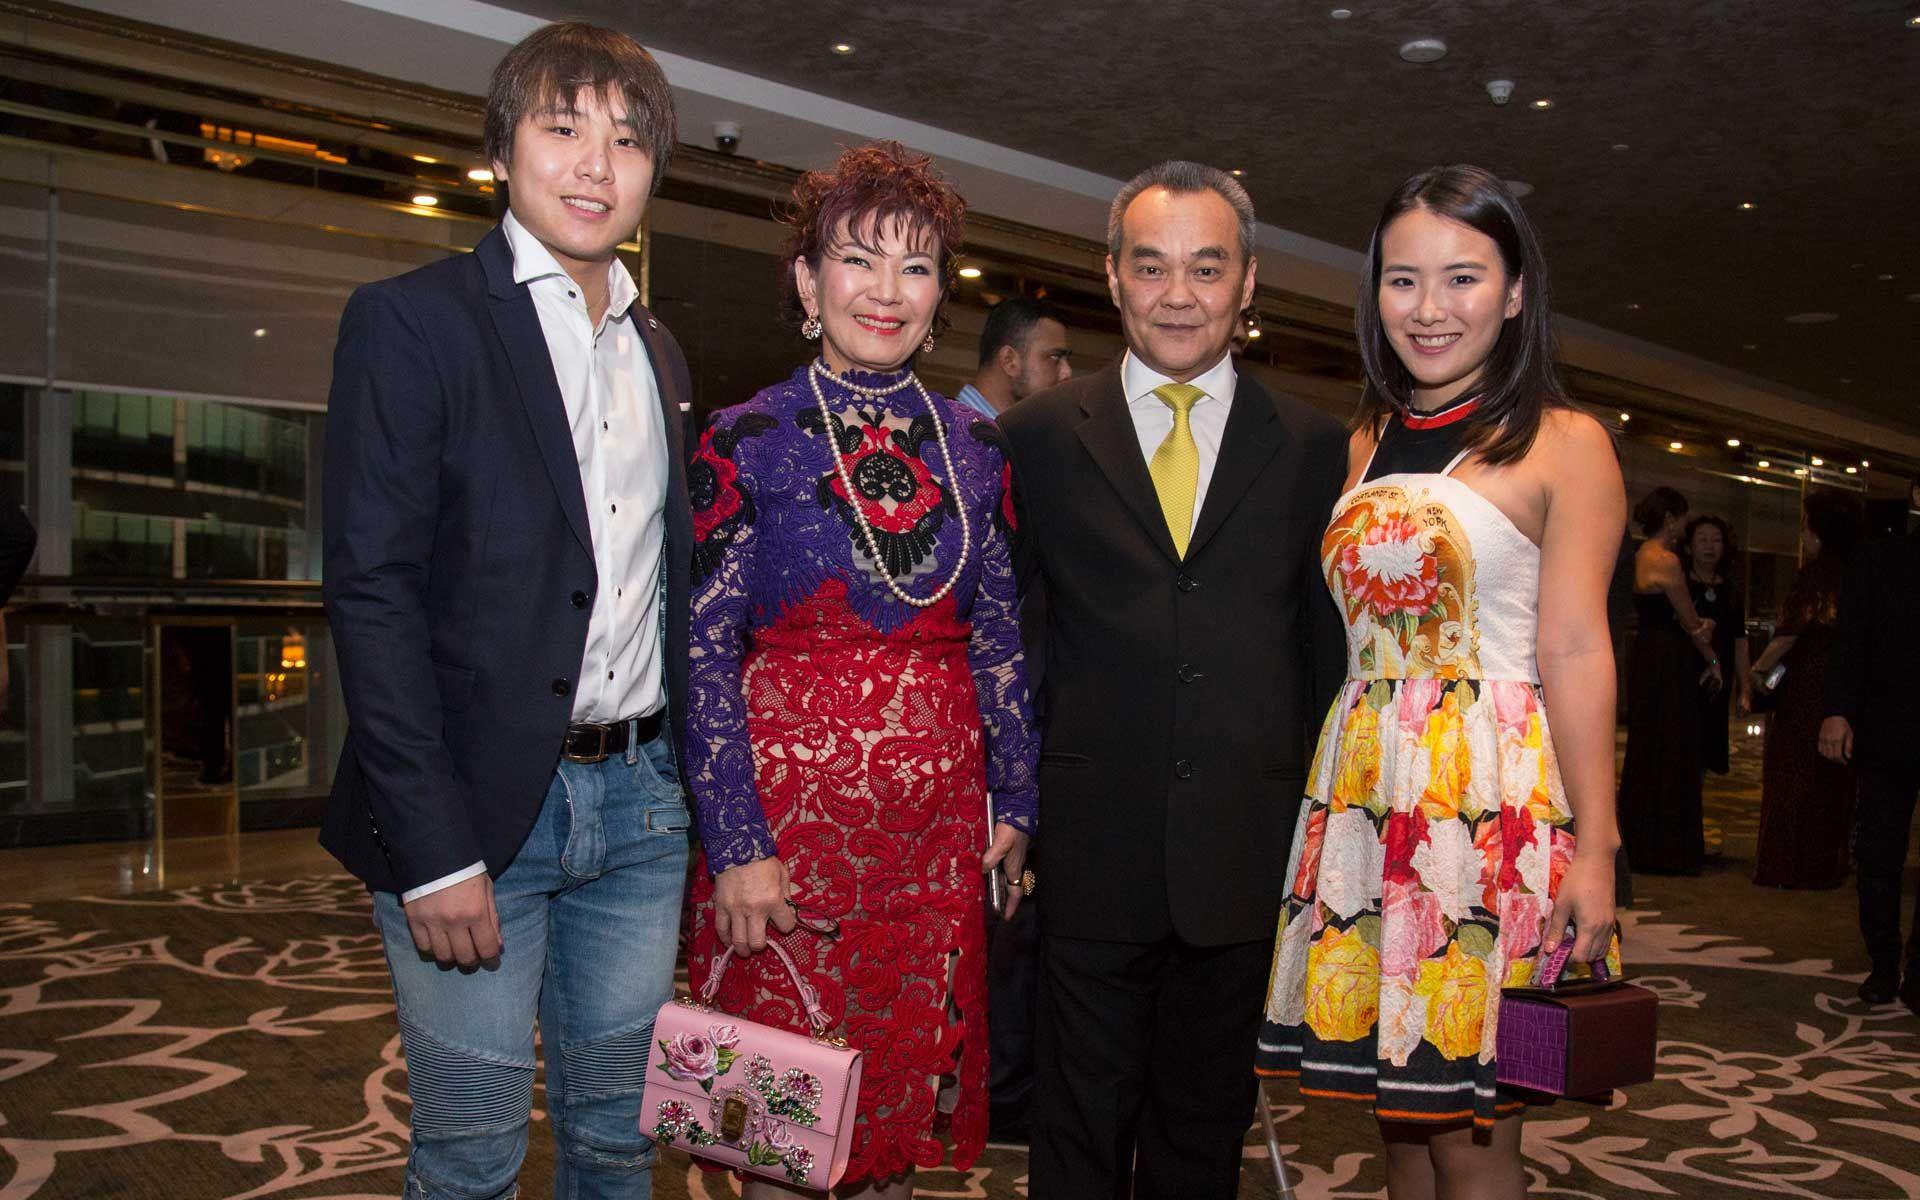 Daryl Ong, Datin Kate Ong, Dato' Eric Ong and Natalie Ong